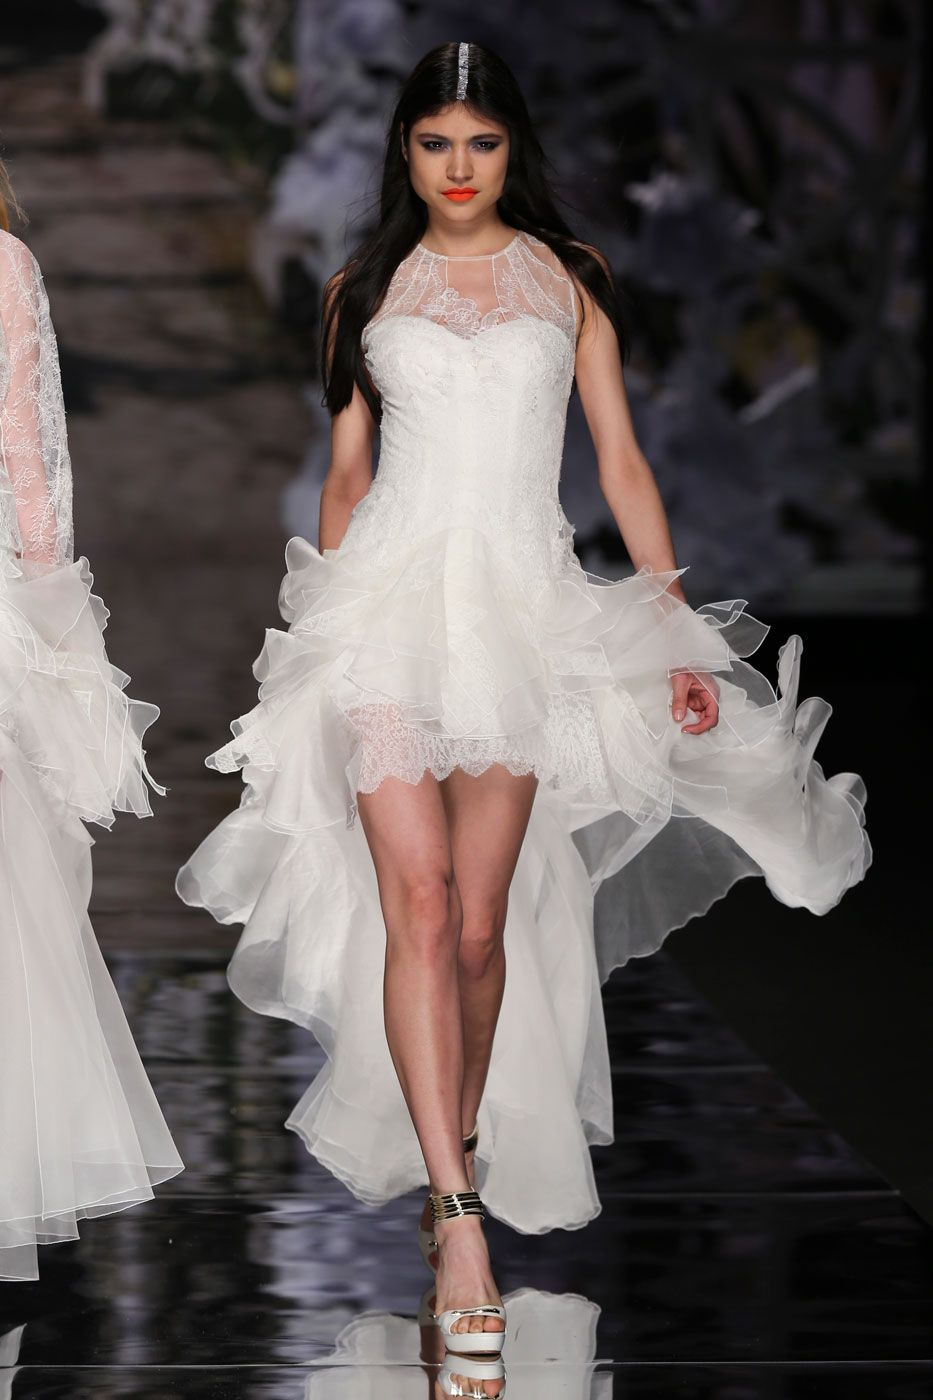 Robe de mariée: sirène ou courte? | Femina